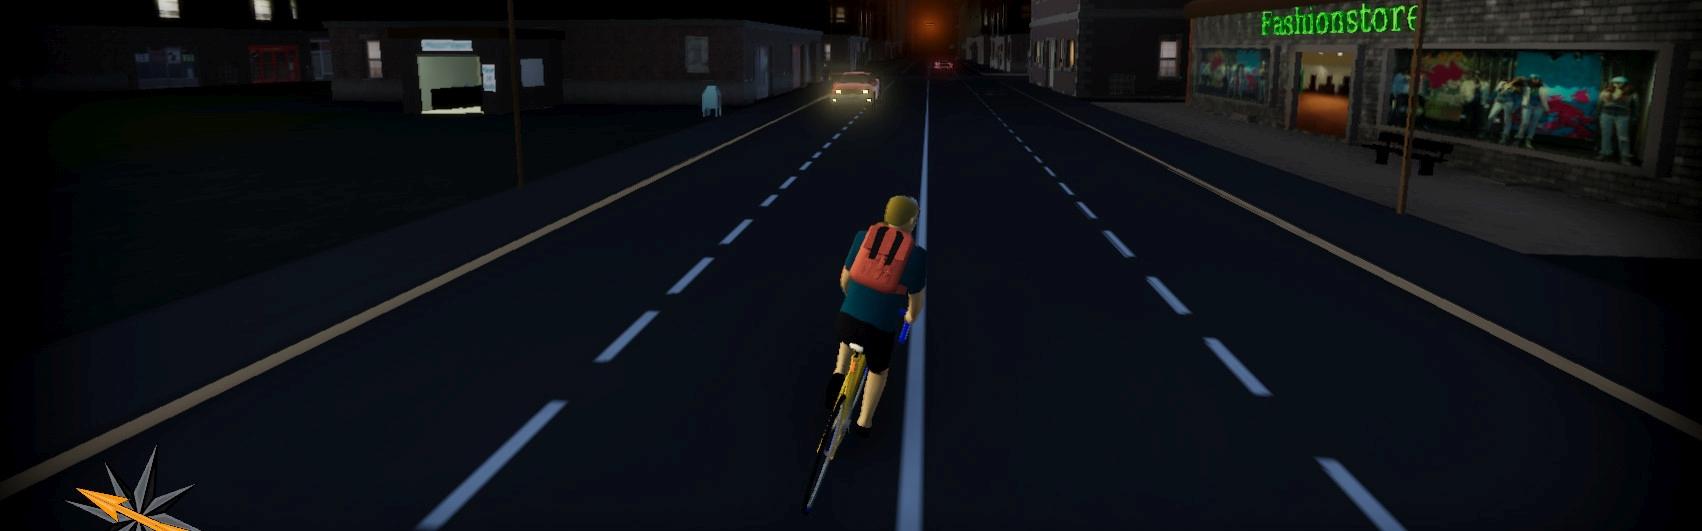 B.M.G. 19 - Bike Messenger Go!  Steam Key GLOBAL